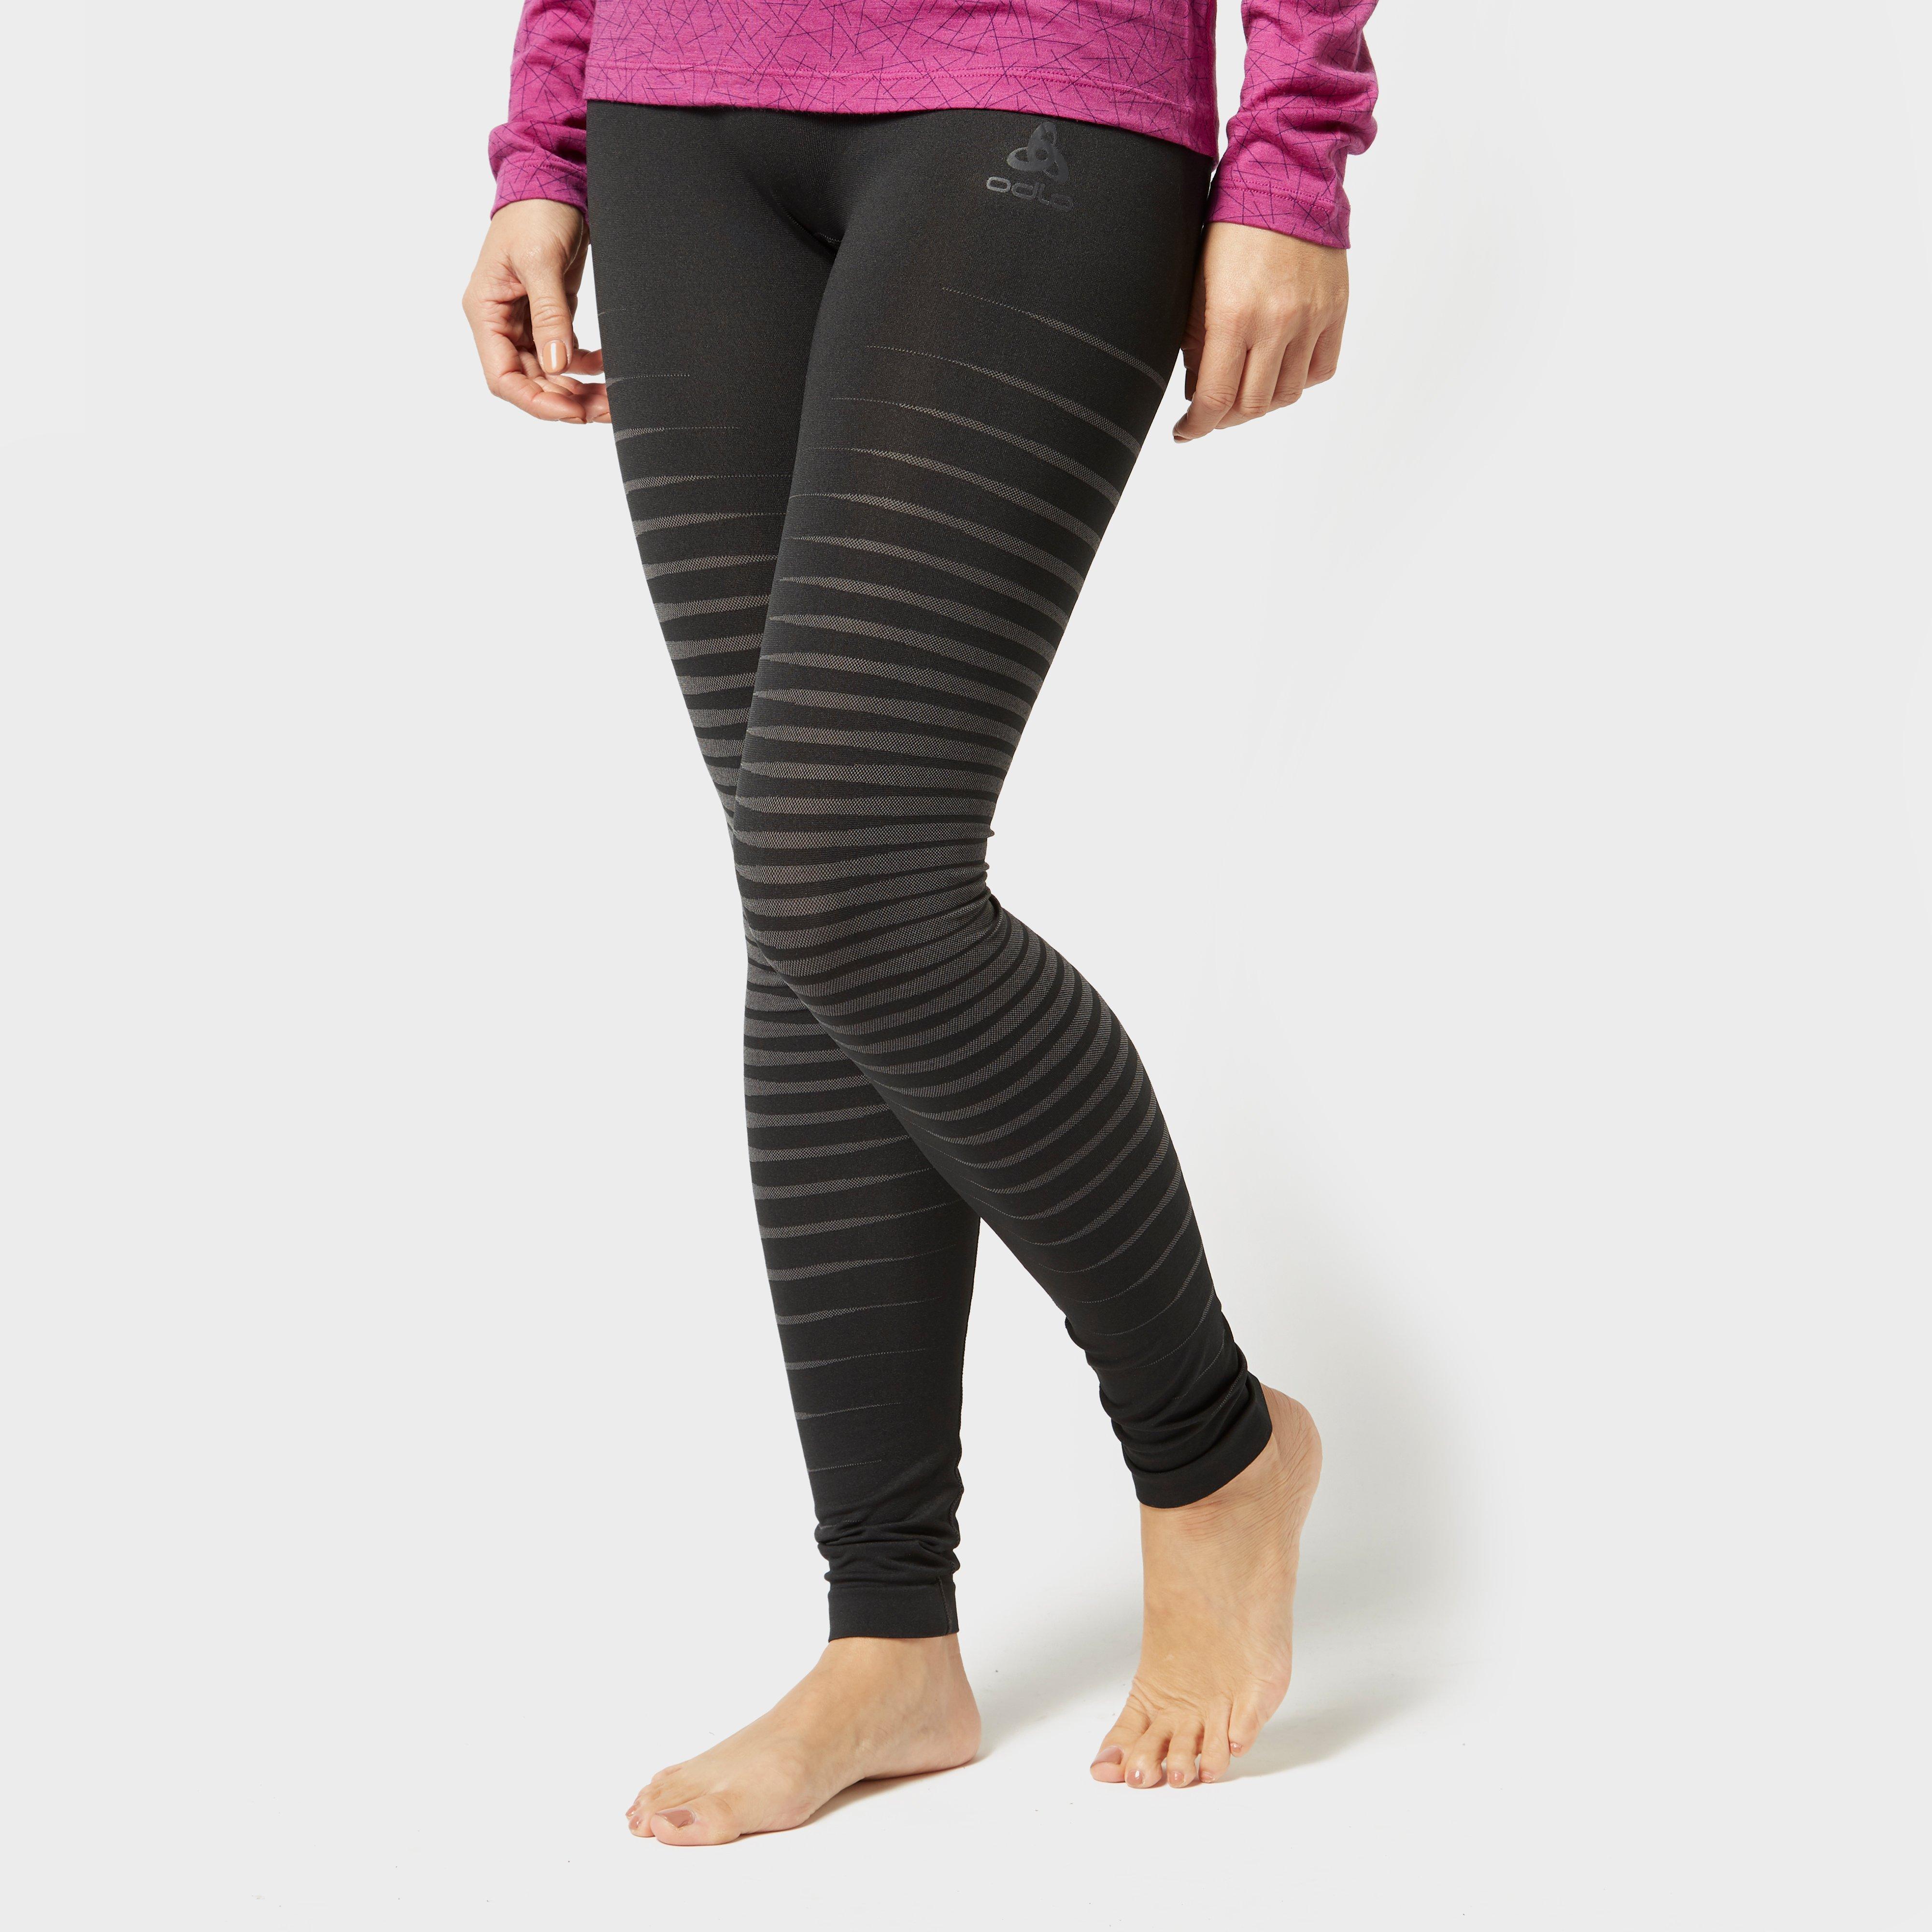 Odlo Odlo Womens Performance Light Base Layer Pants - Black, Black